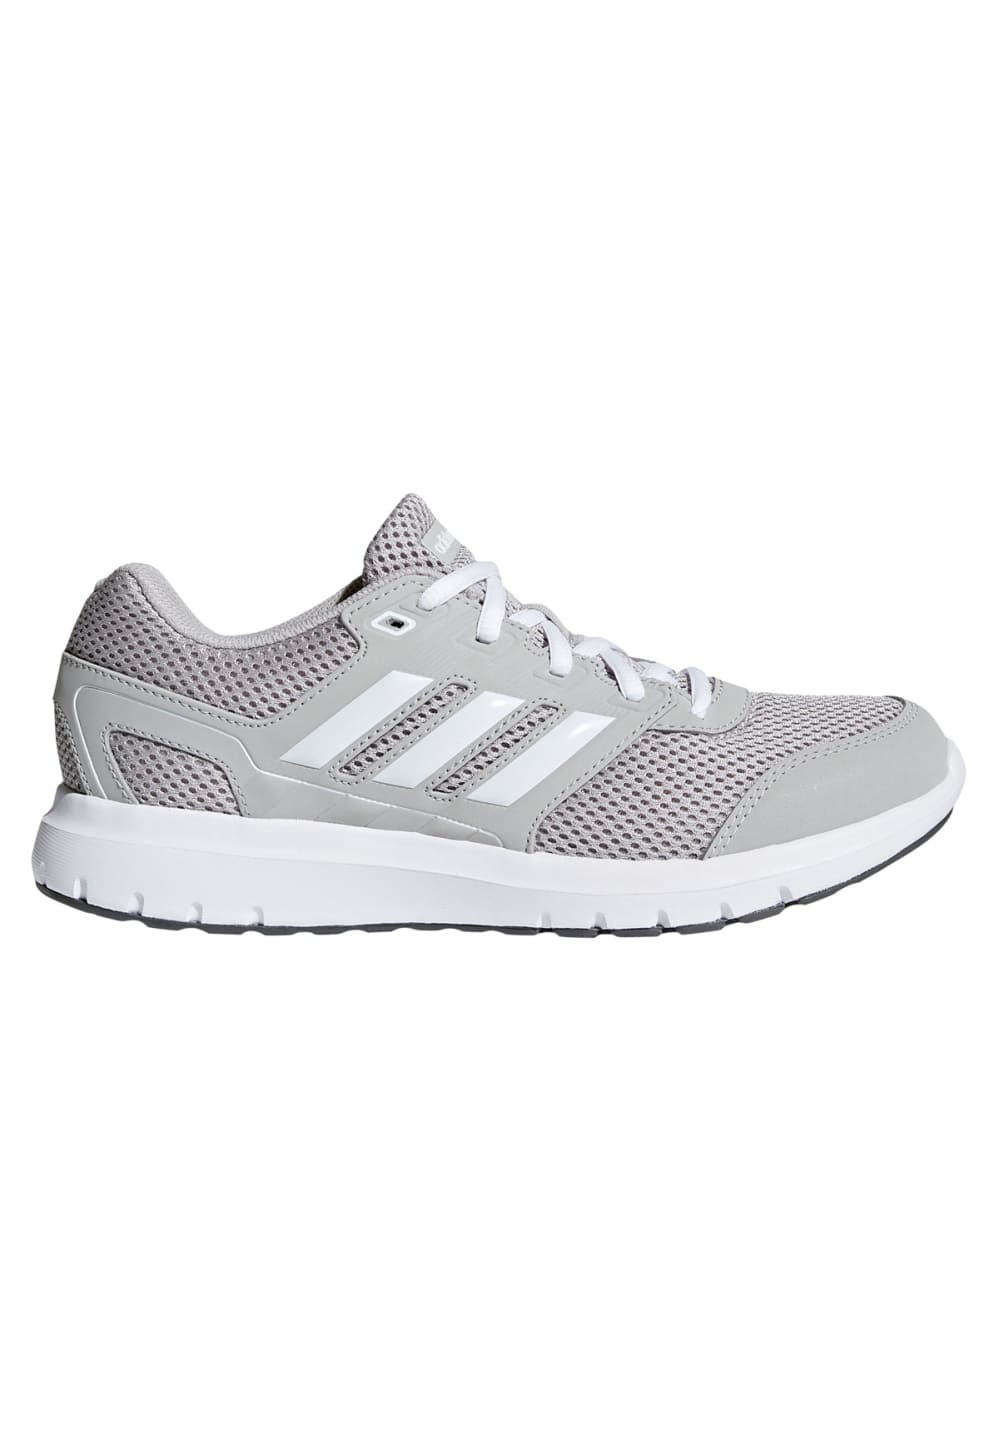 W 0 adidas Duramo Chaussures pour Gris Lite running Femme 2 QBeECdoWrx